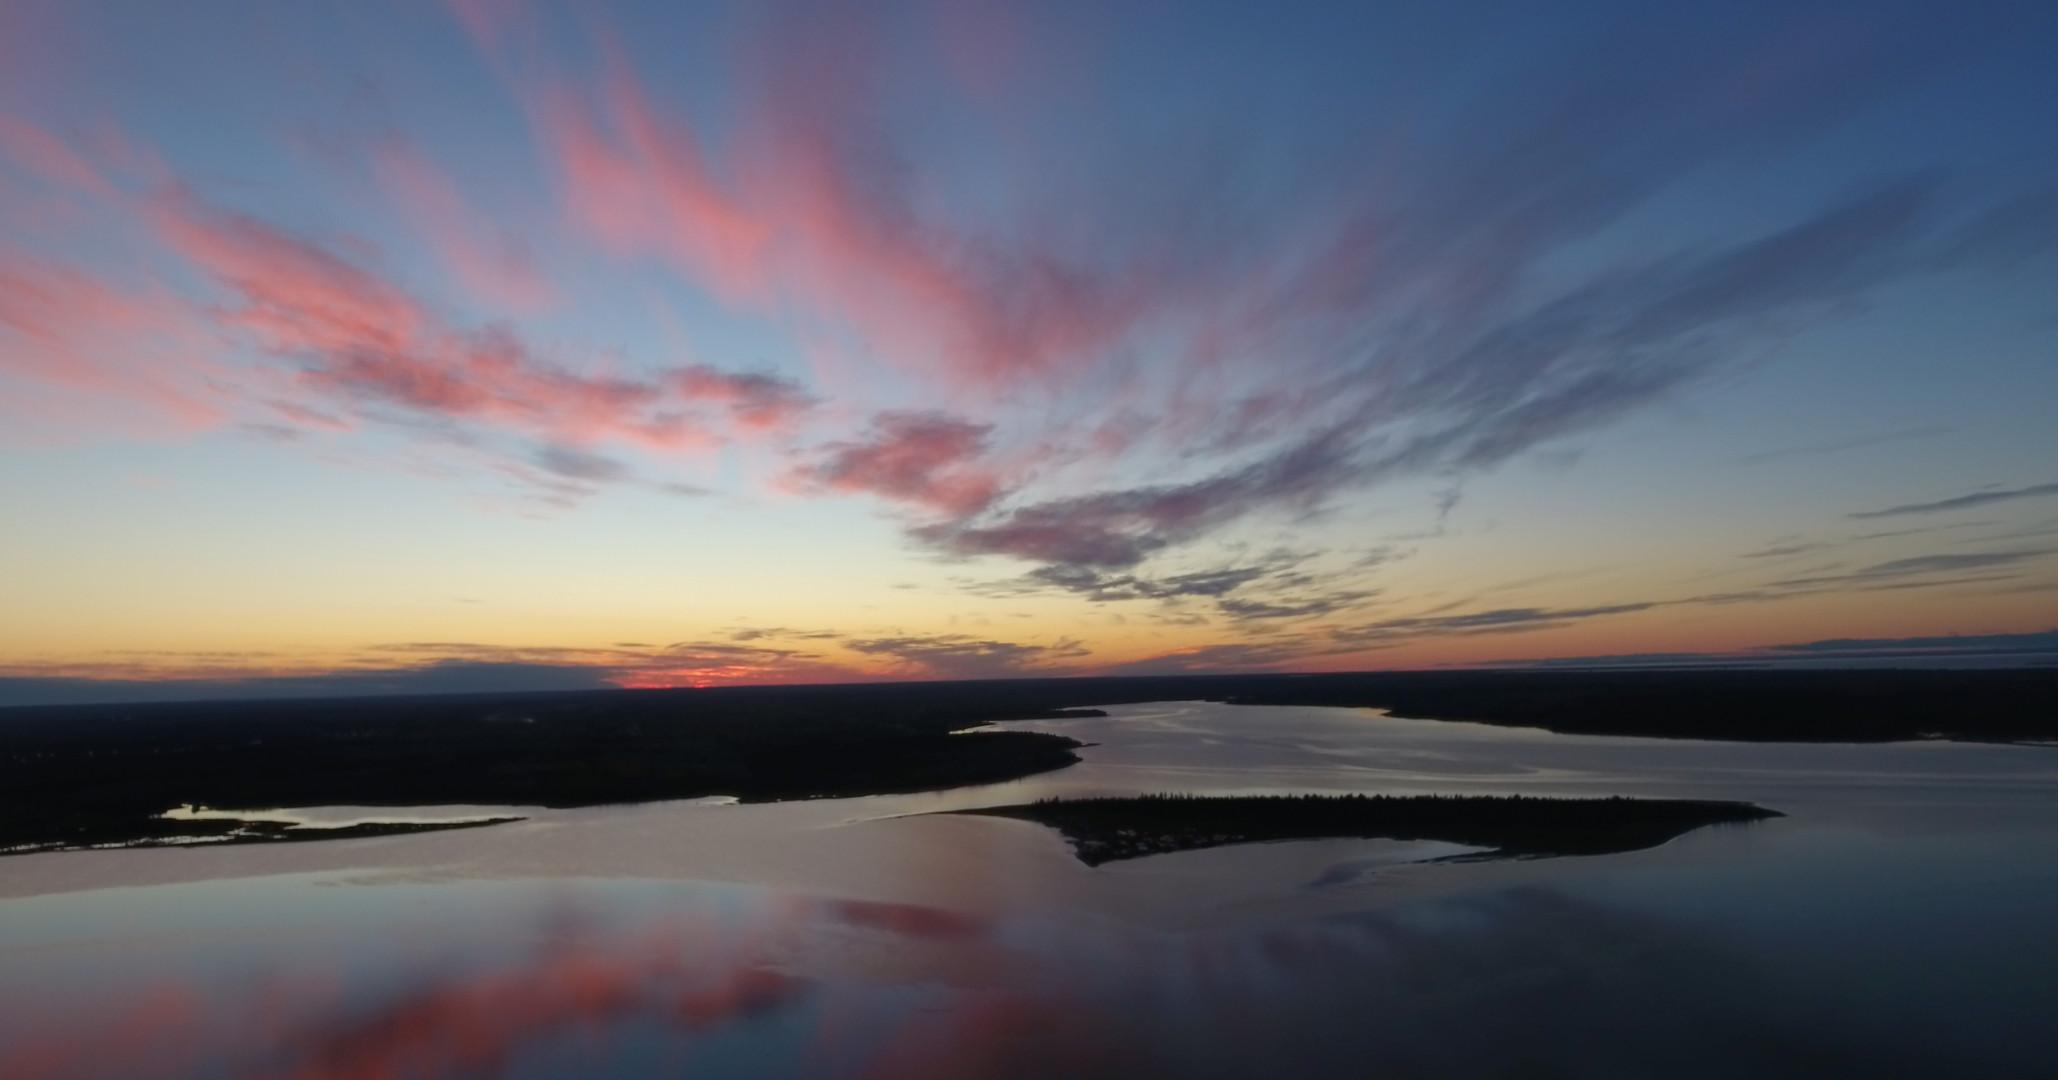 Cielo-Sunset and Munro Island.jpg